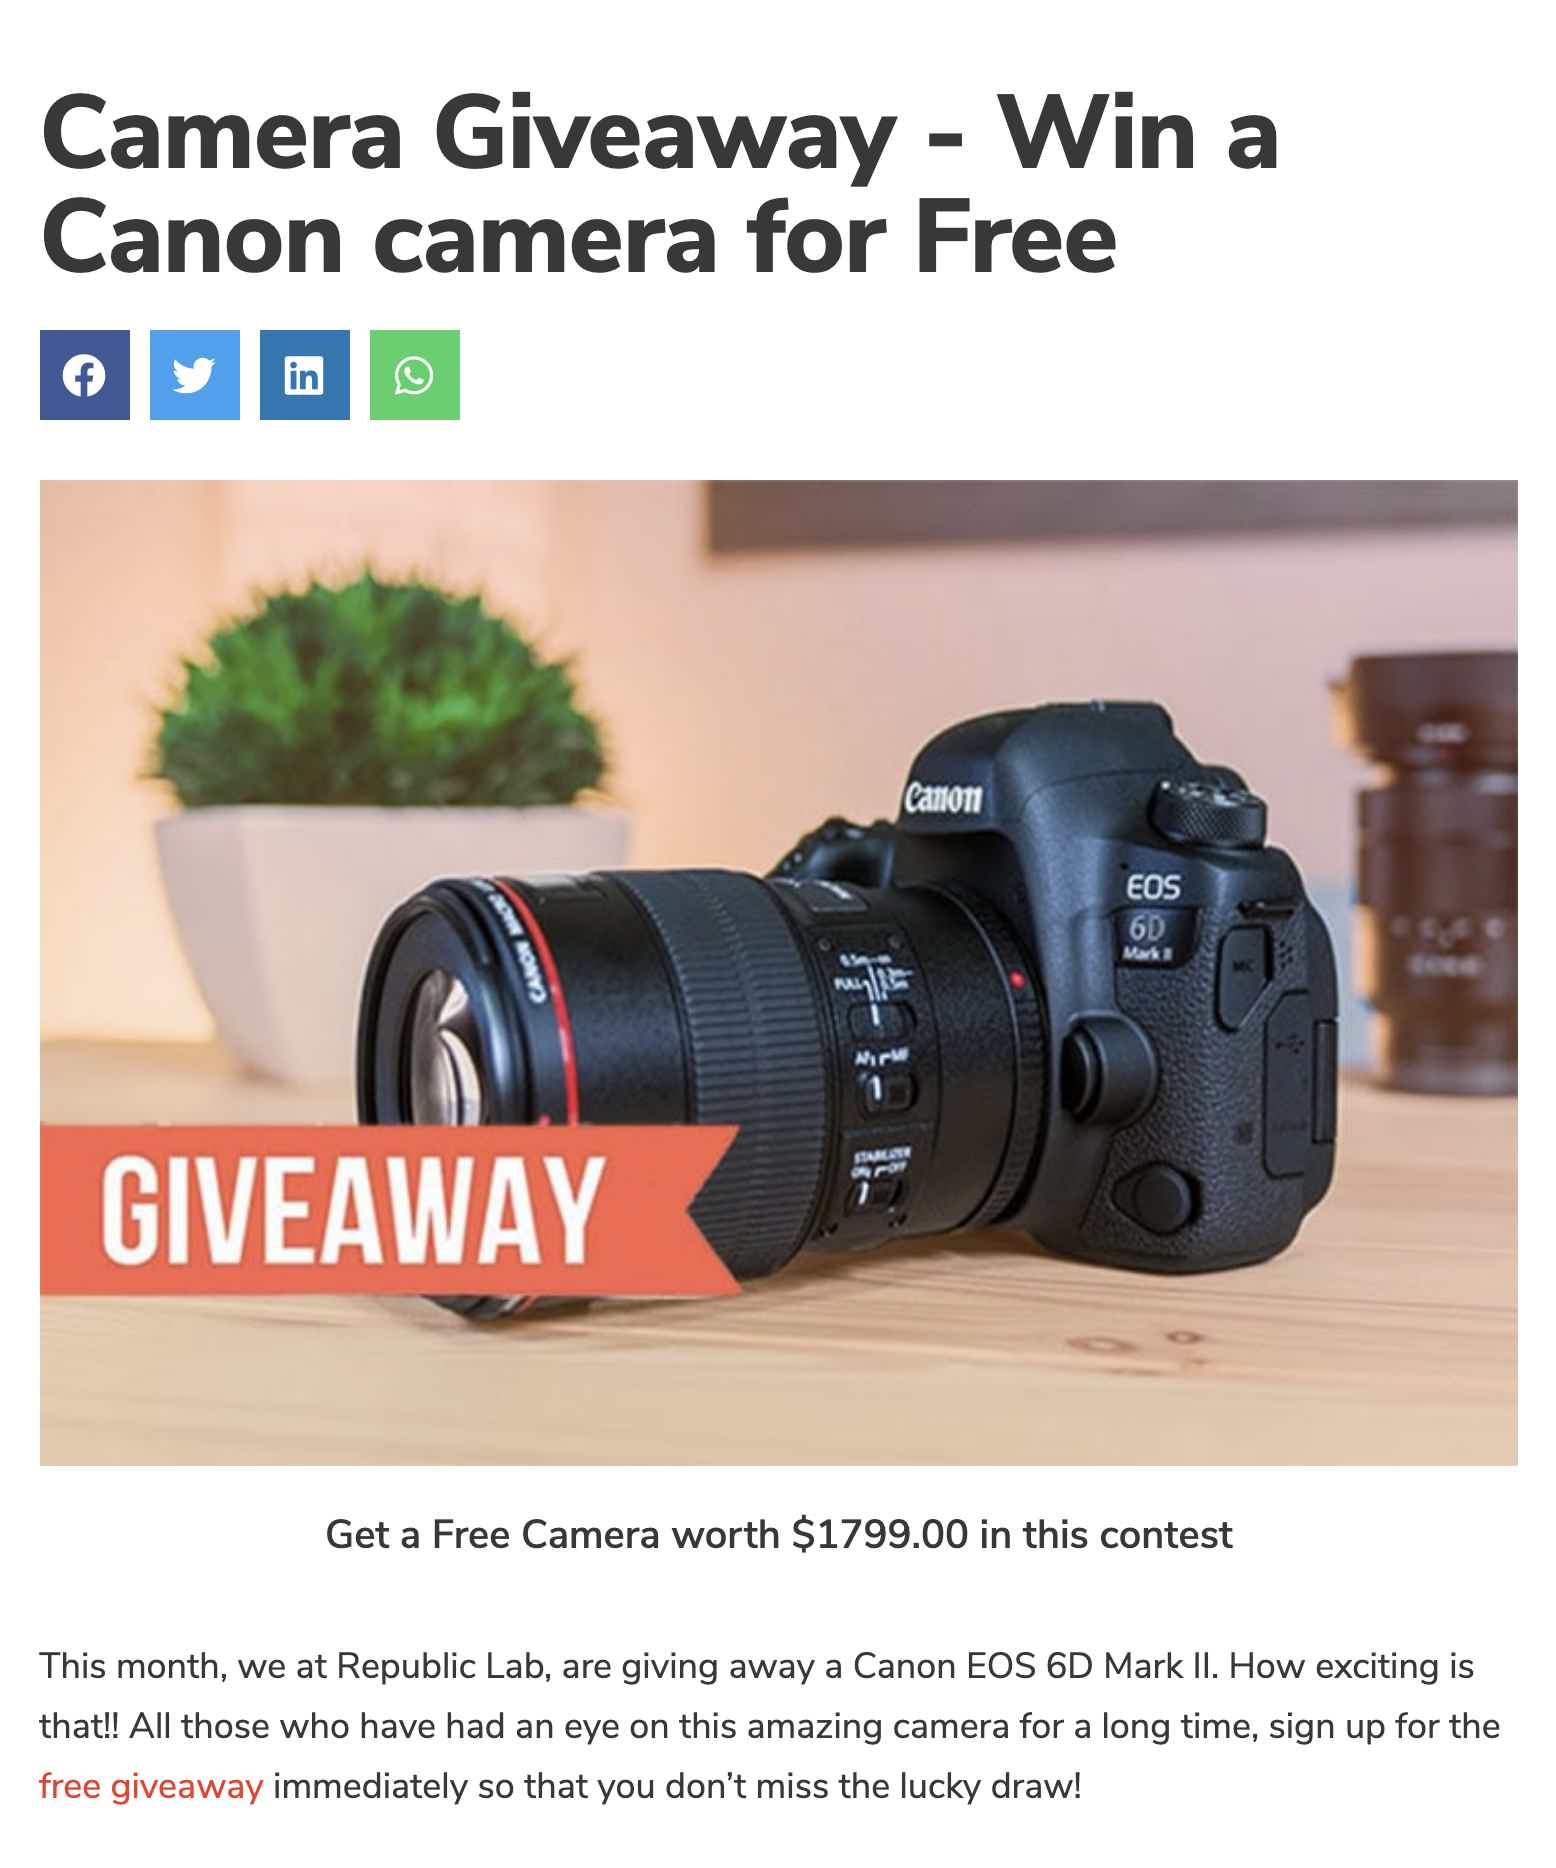 Republic lab camera giveaway